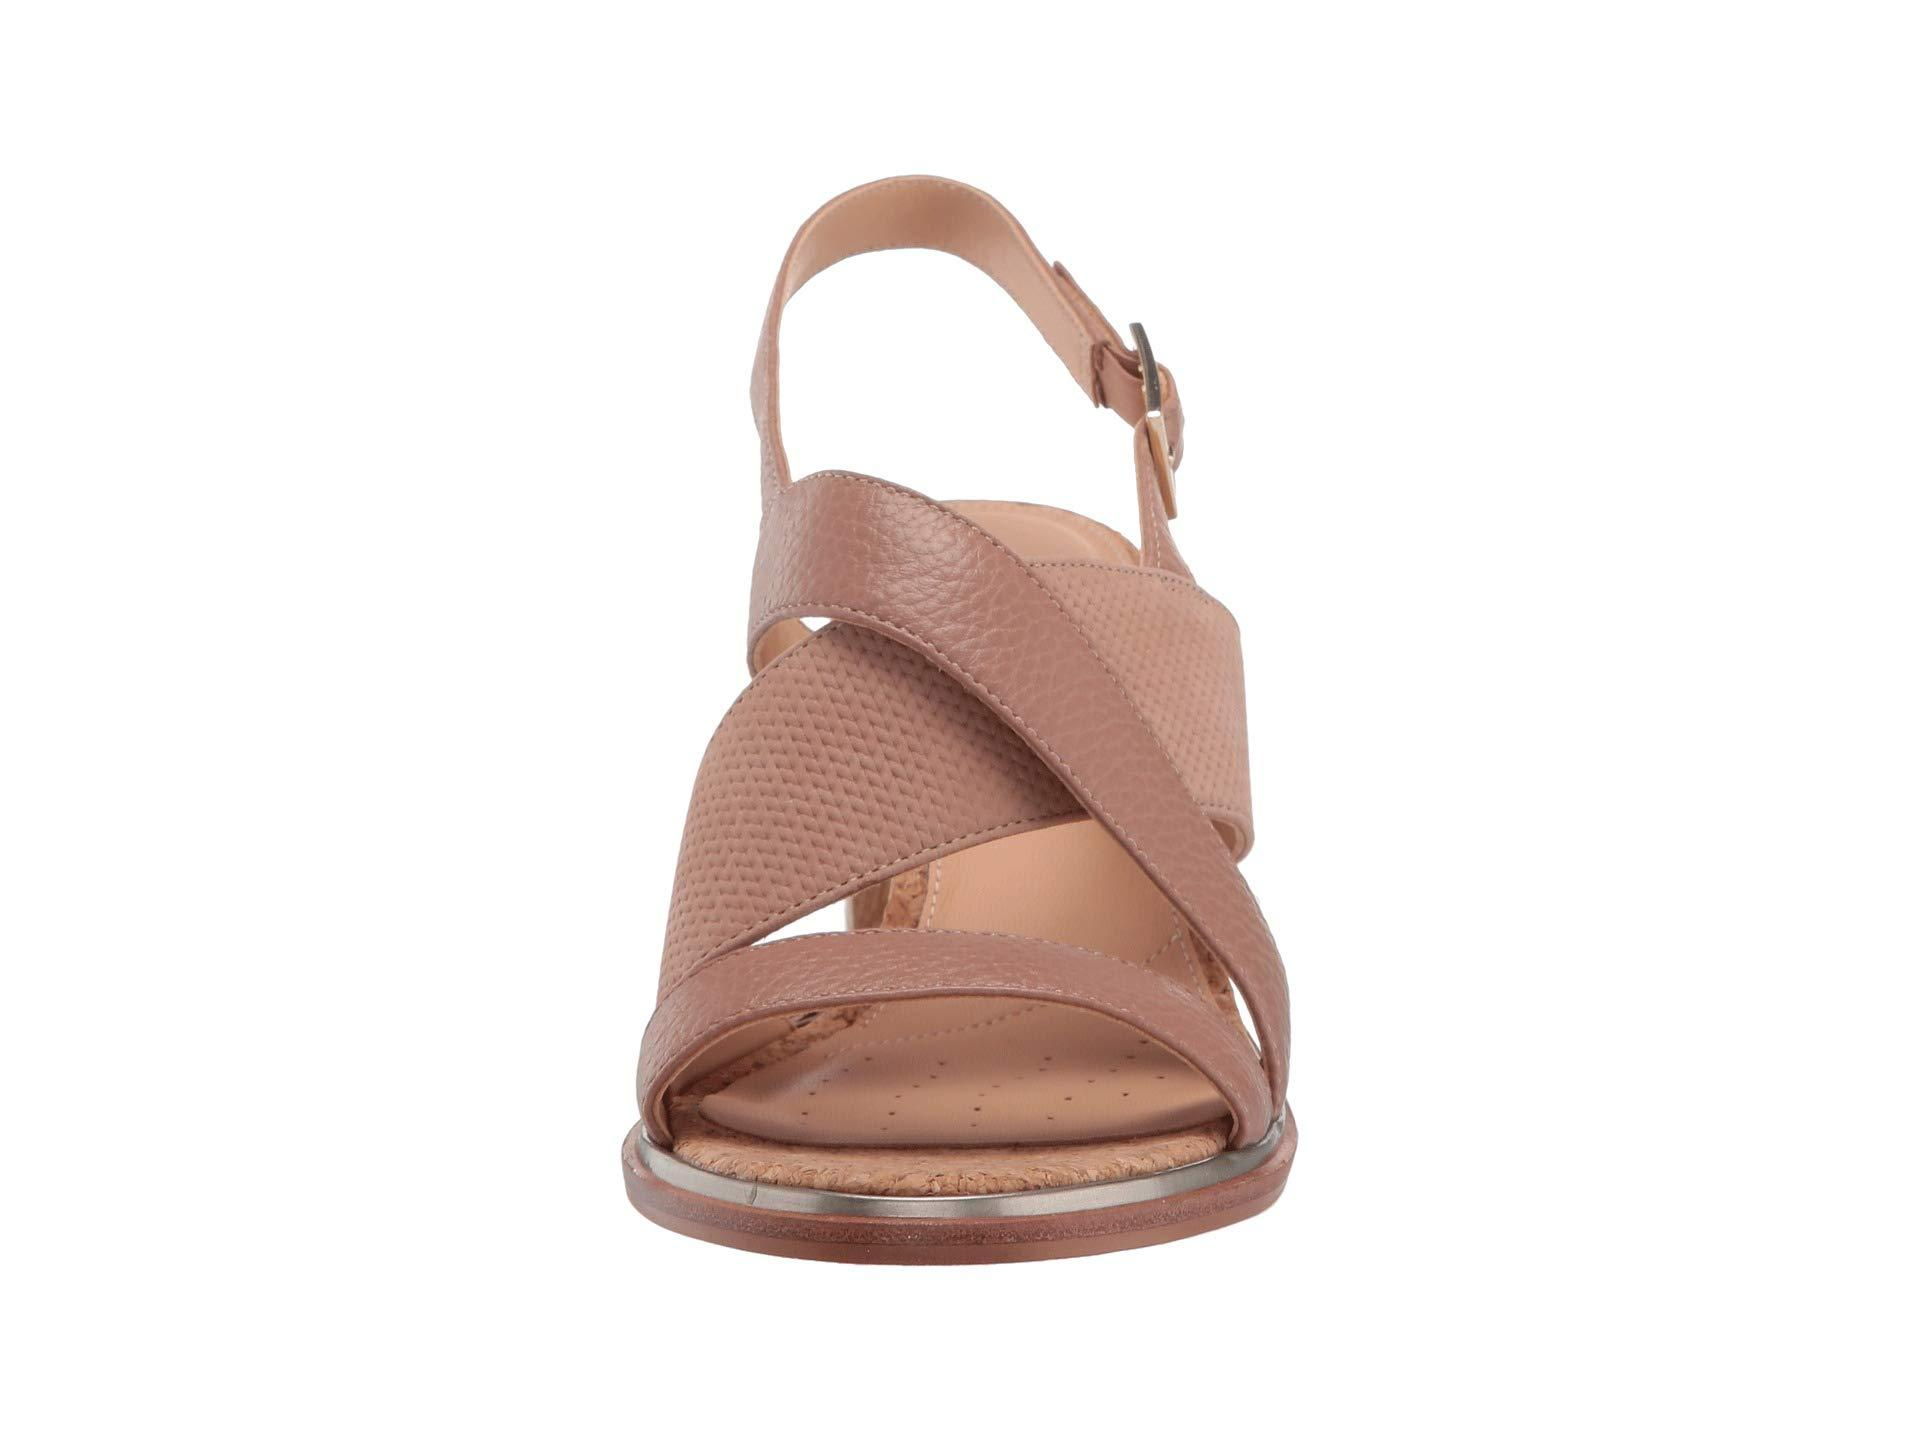 bd120d62f85 Clarks - Natural Ellis Tilda (nude Leather) High Heels - Lyst. View  fullscreen